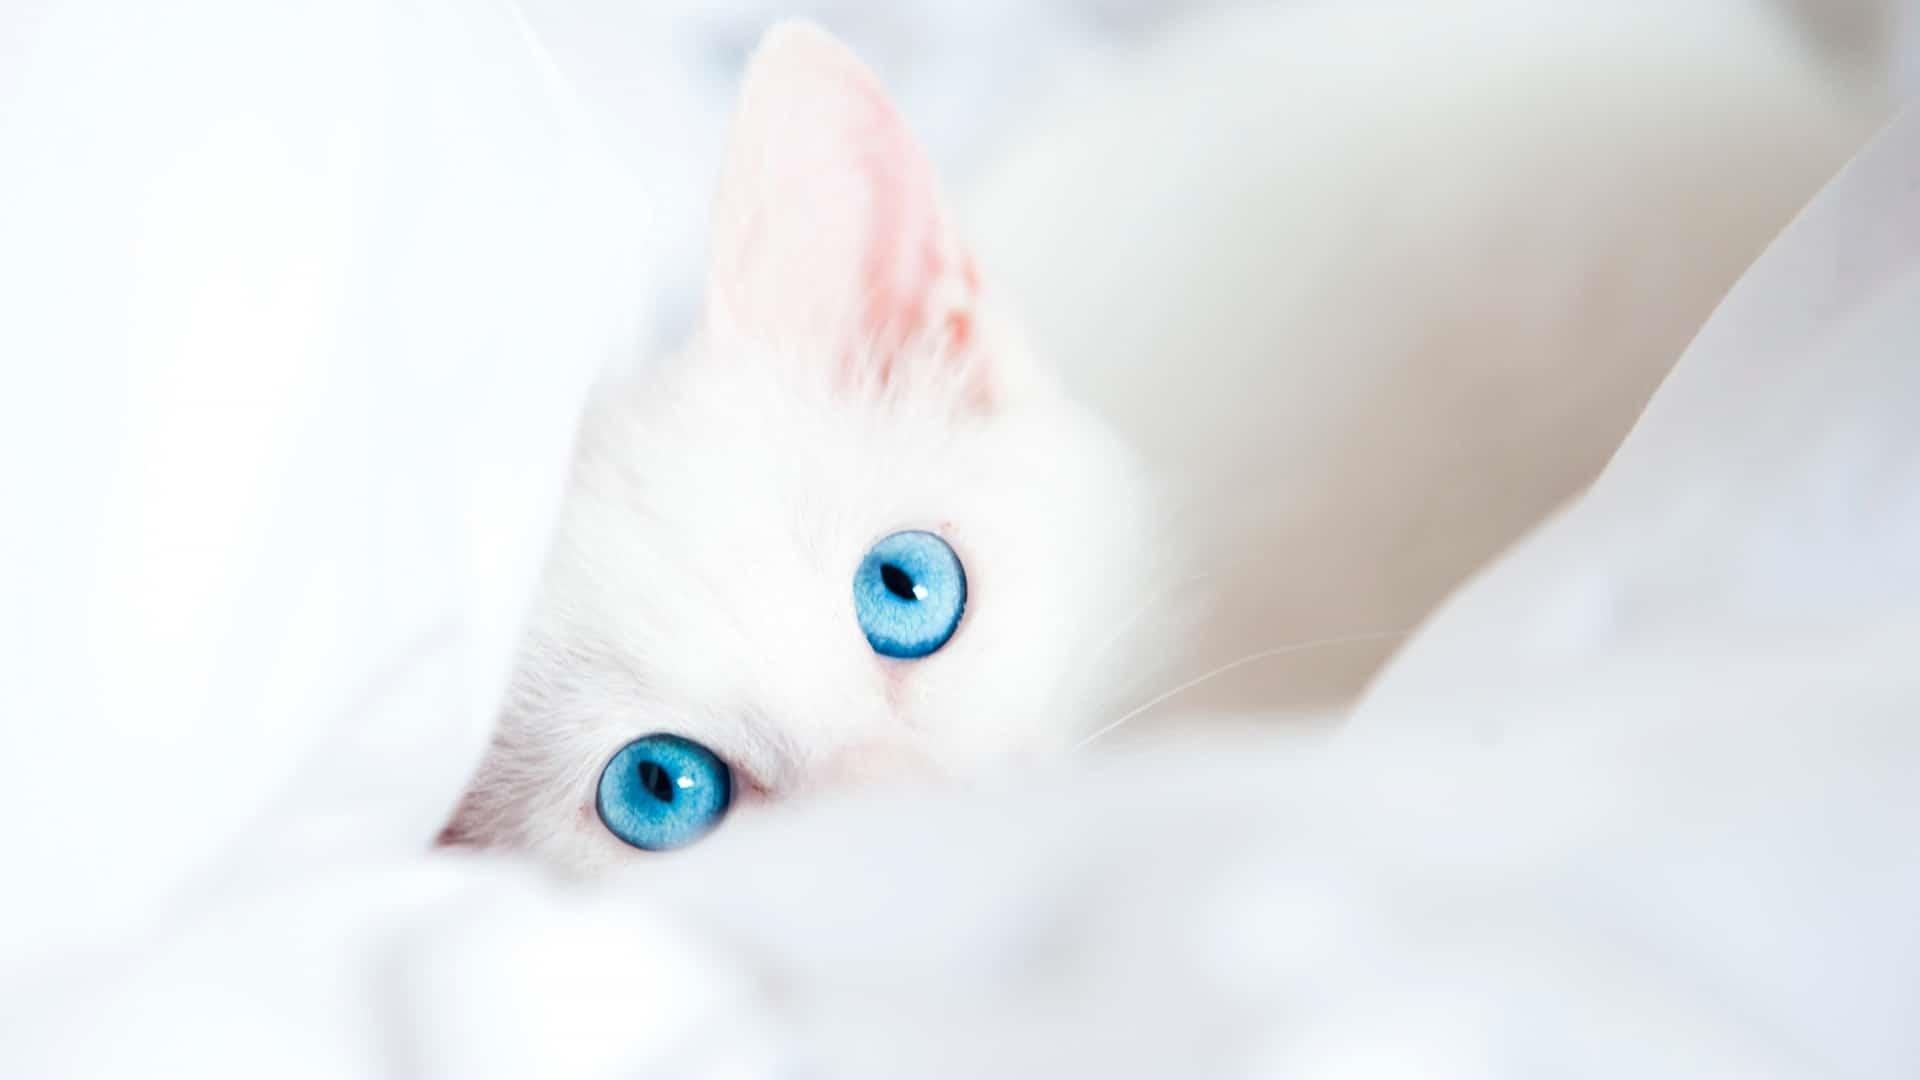 White Cat wallpaper for computer